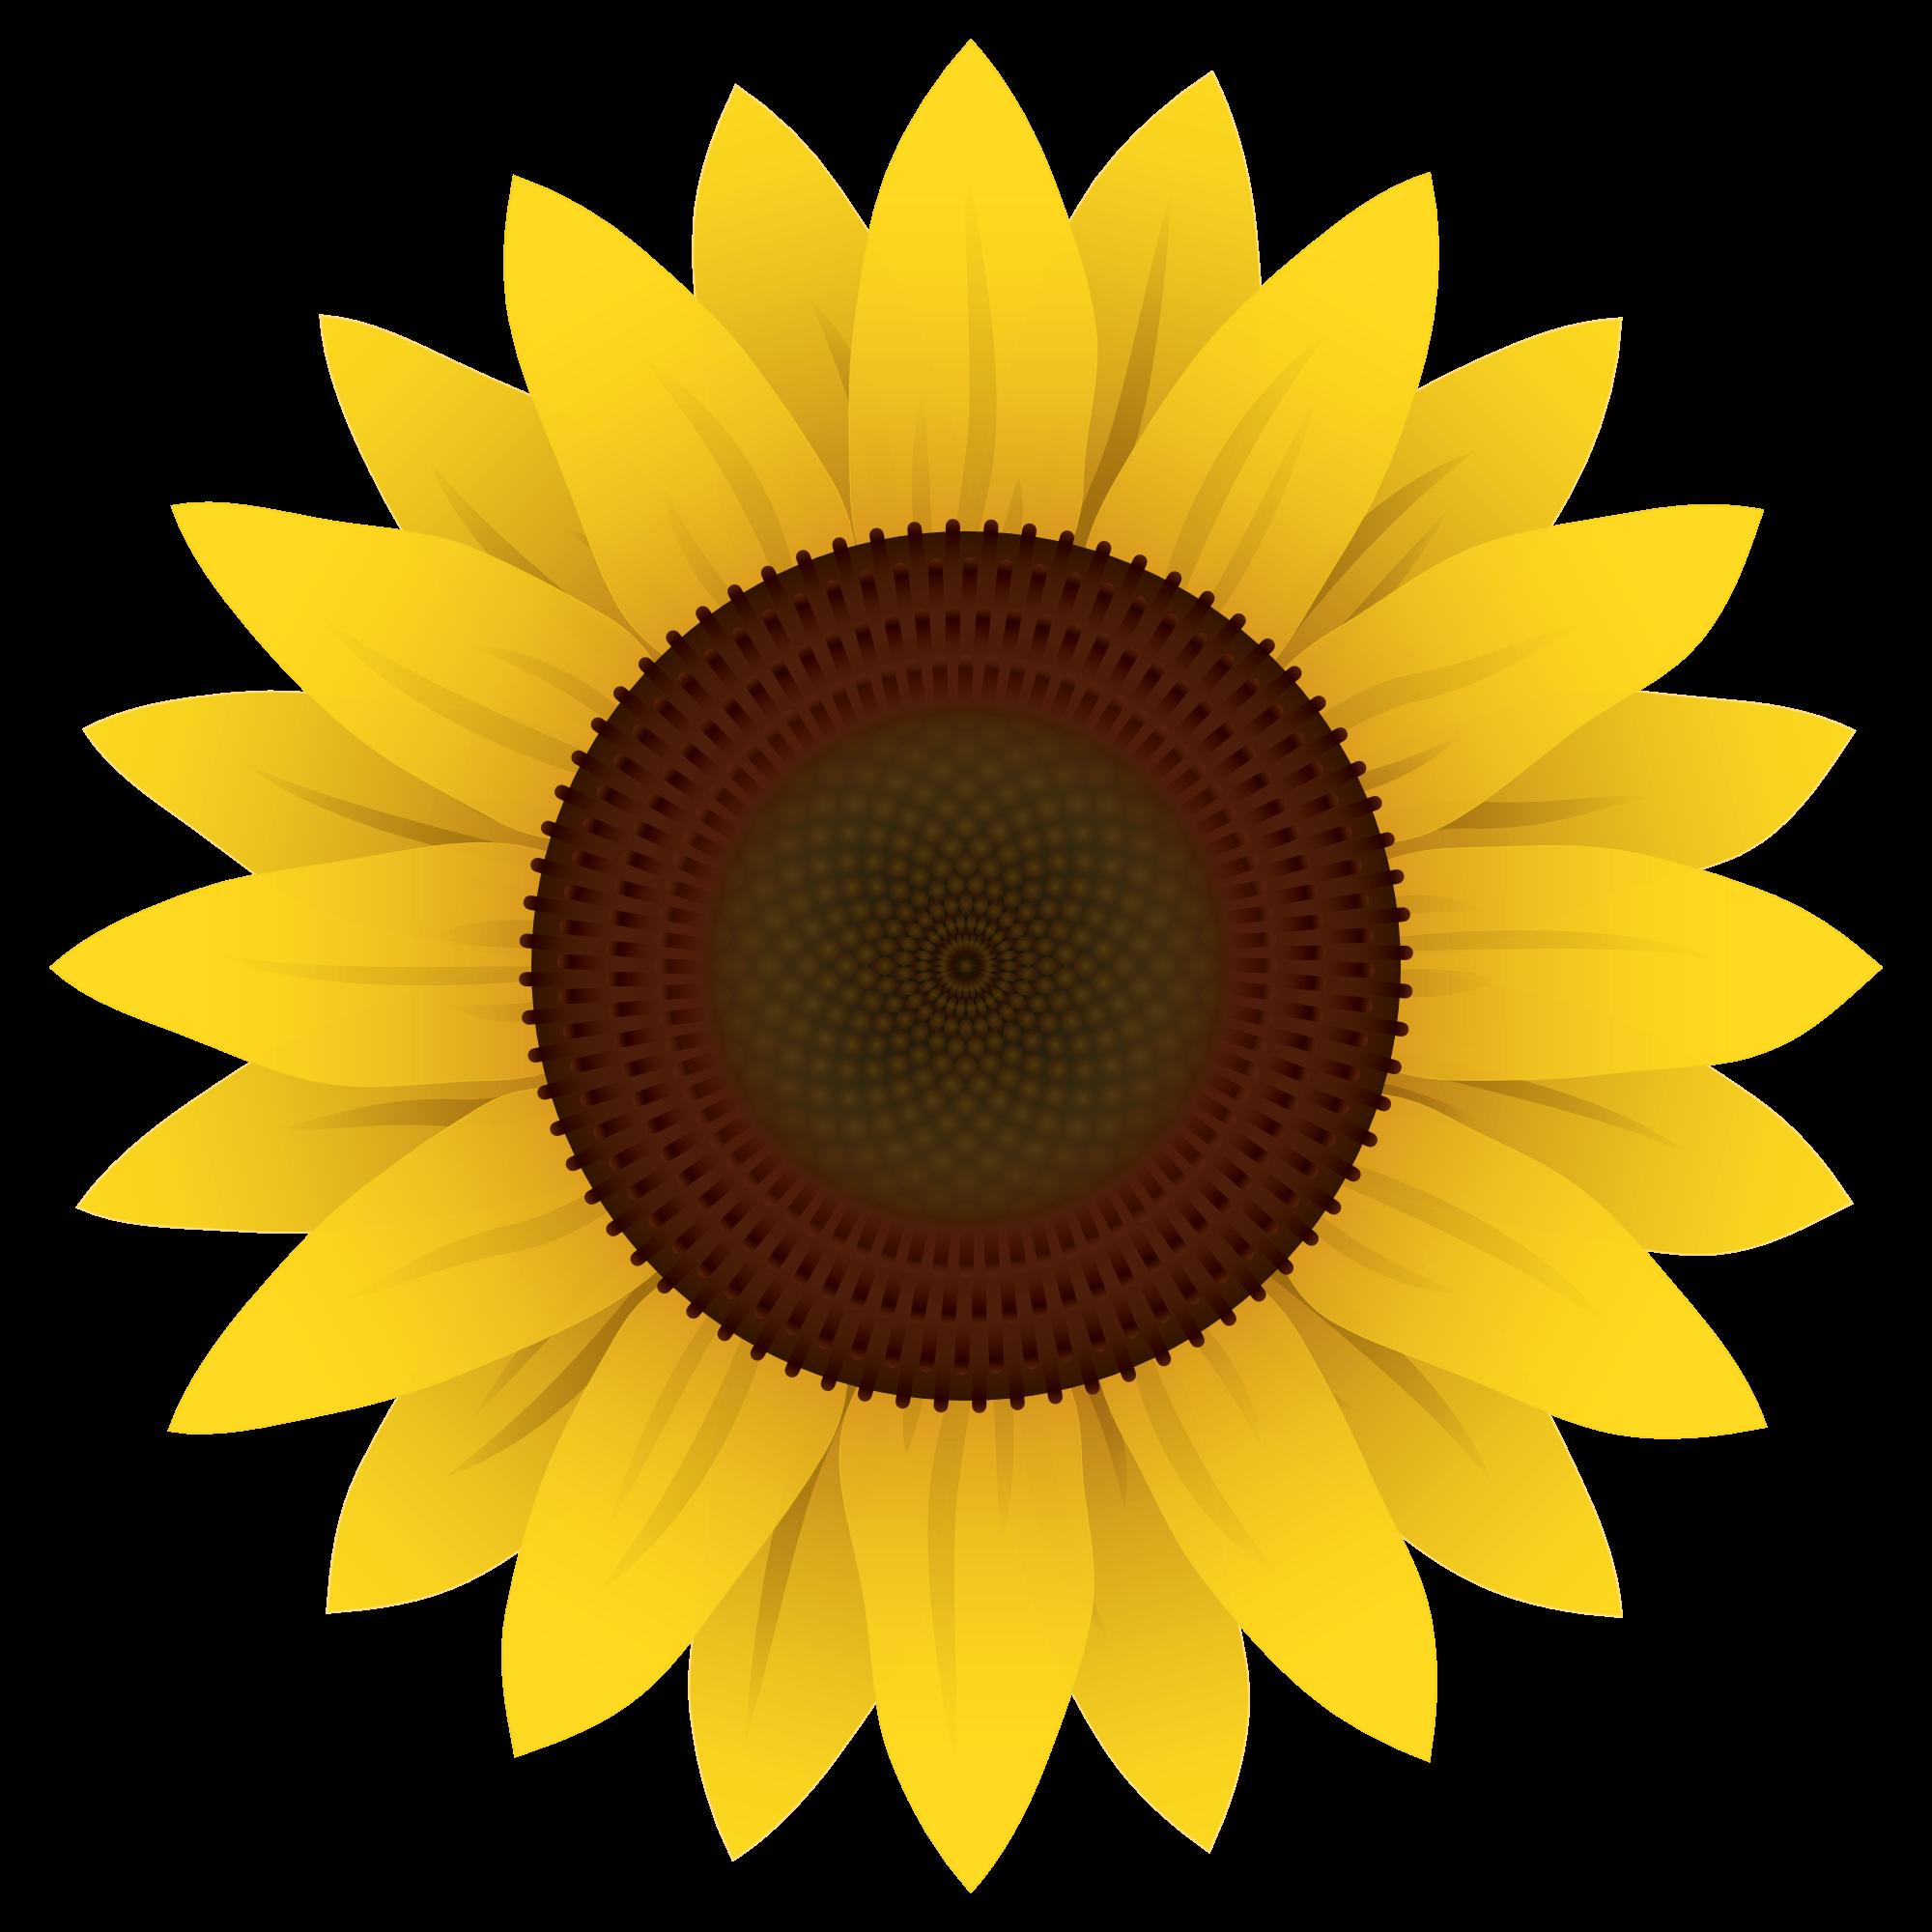 Sunflower Icon Cartoon Sunflower Png Sunflower Drawing Sunflower Images Sunflower Clipart